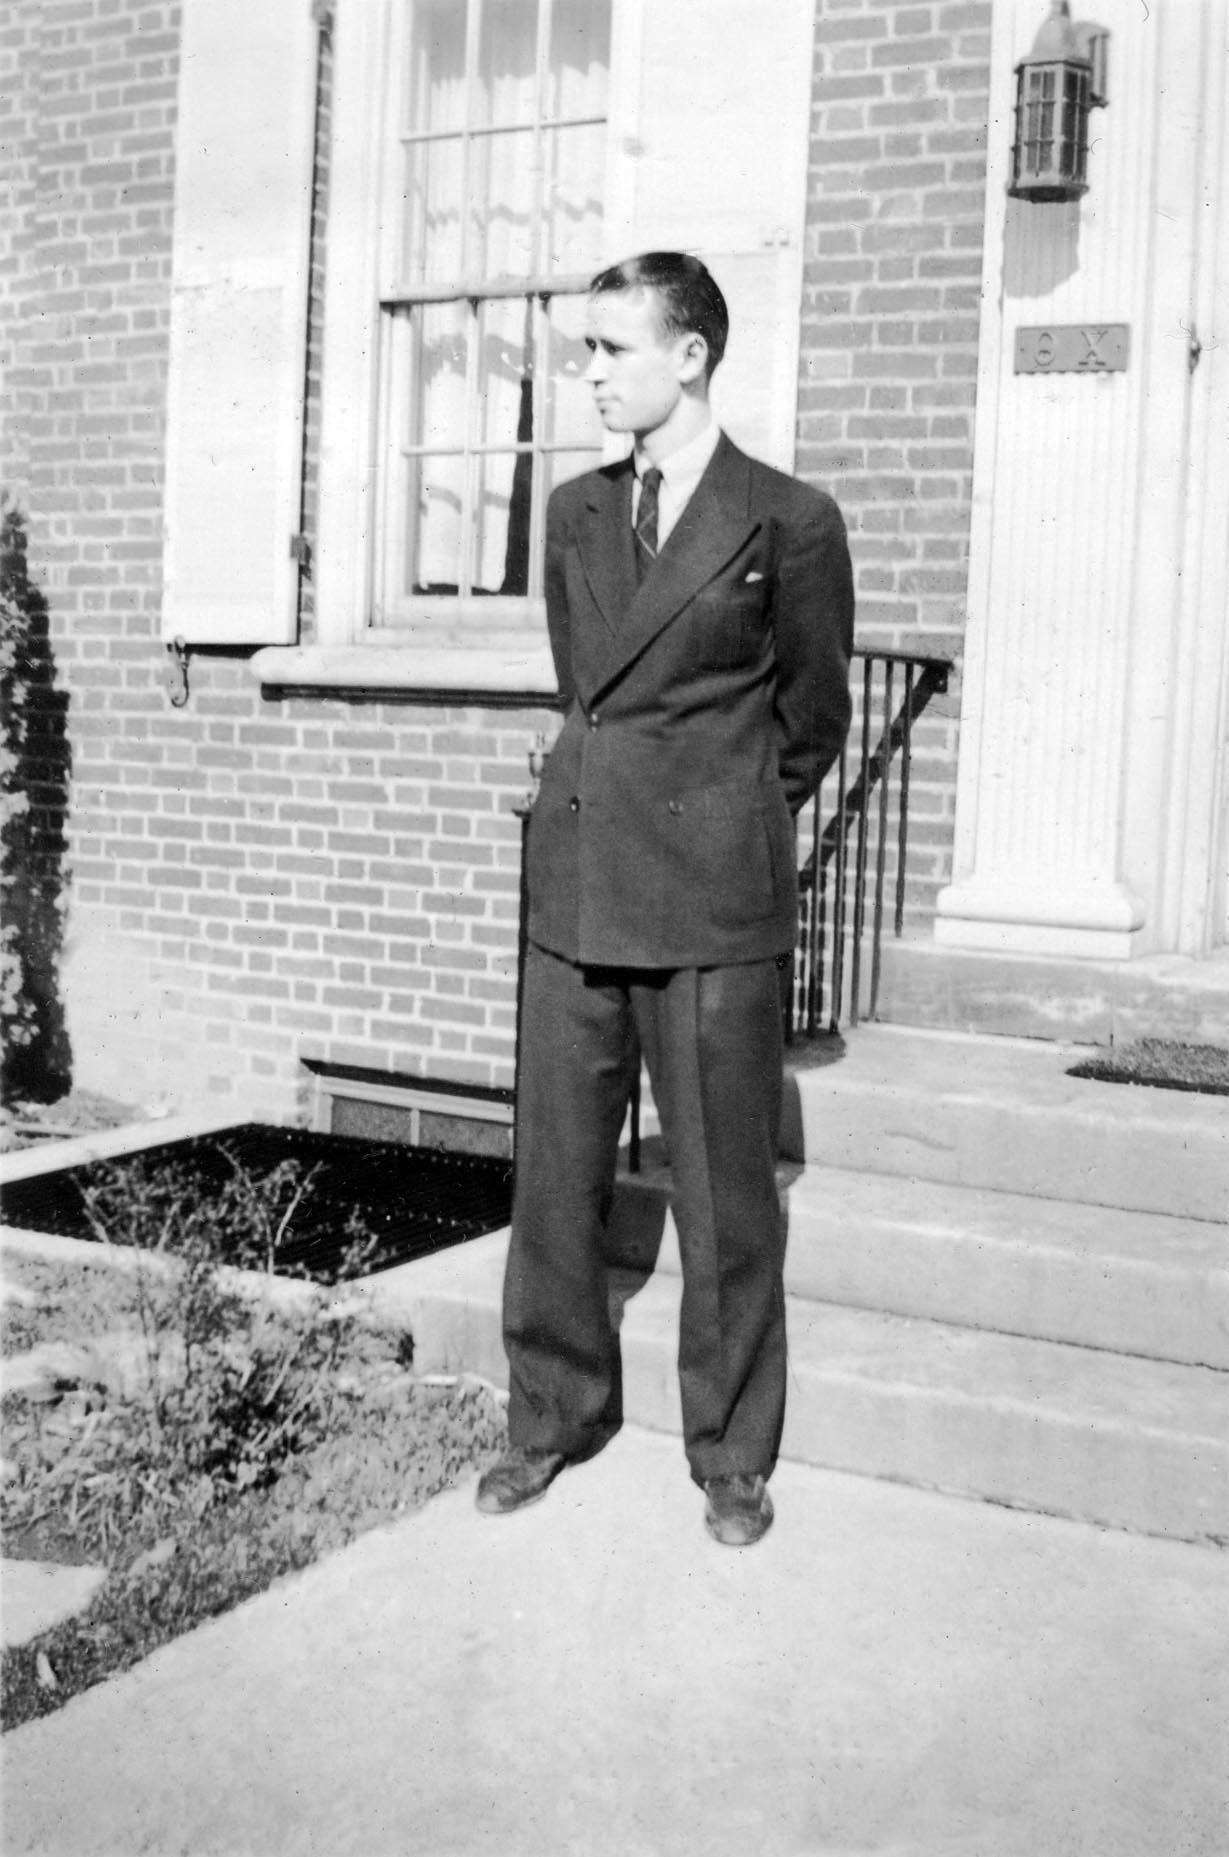 Jack M. Patterson 1937 - Pittsburgh, PA